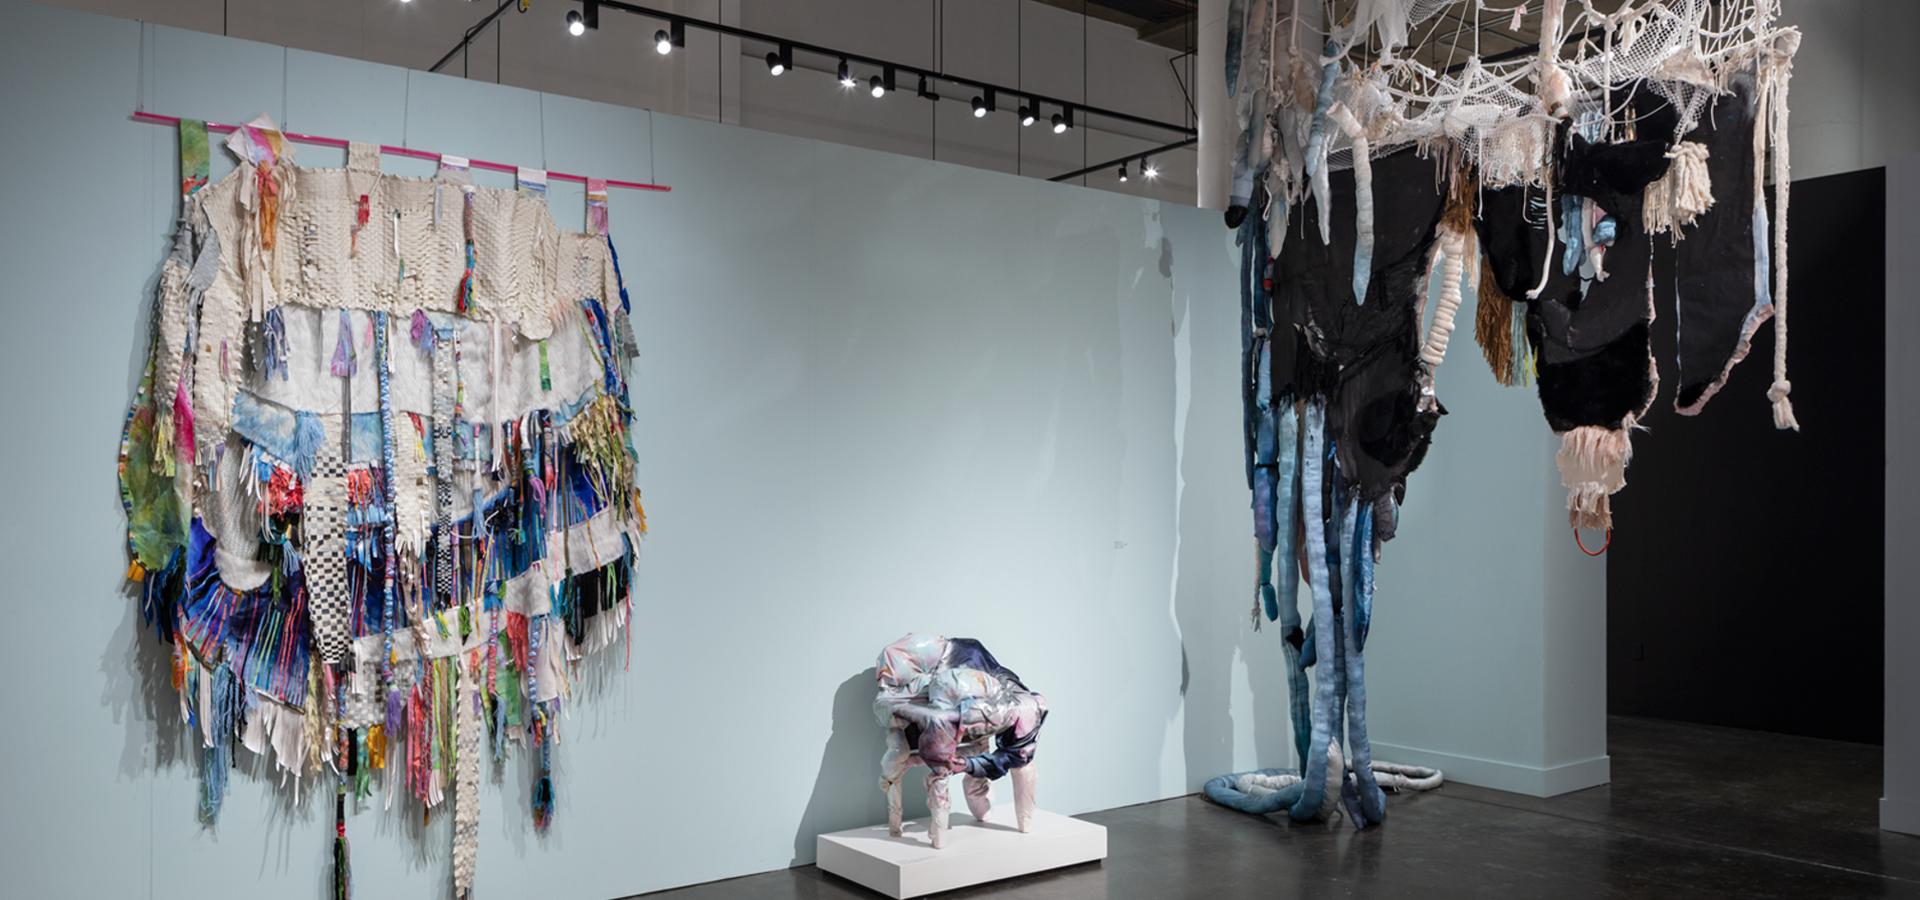 Kathy Sirico installation